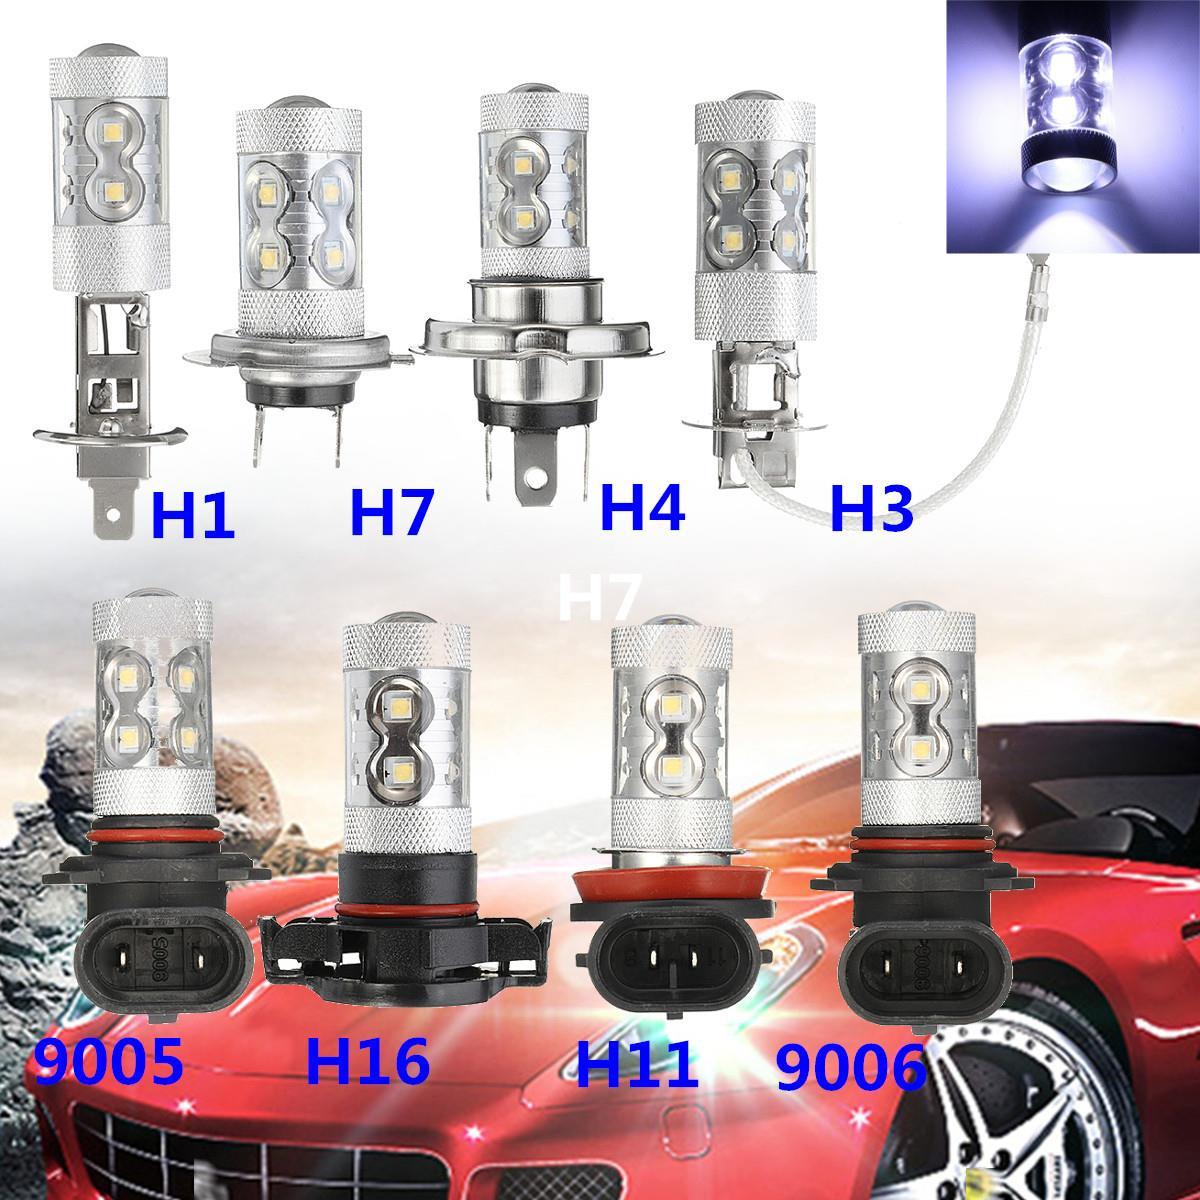 50W High Power Car LED Fog Lights Bulb Auto Lamp 12V H1 H3 H4 H7 H11 H16 9005 9006 LED Car Driving DRL Light Bulbs